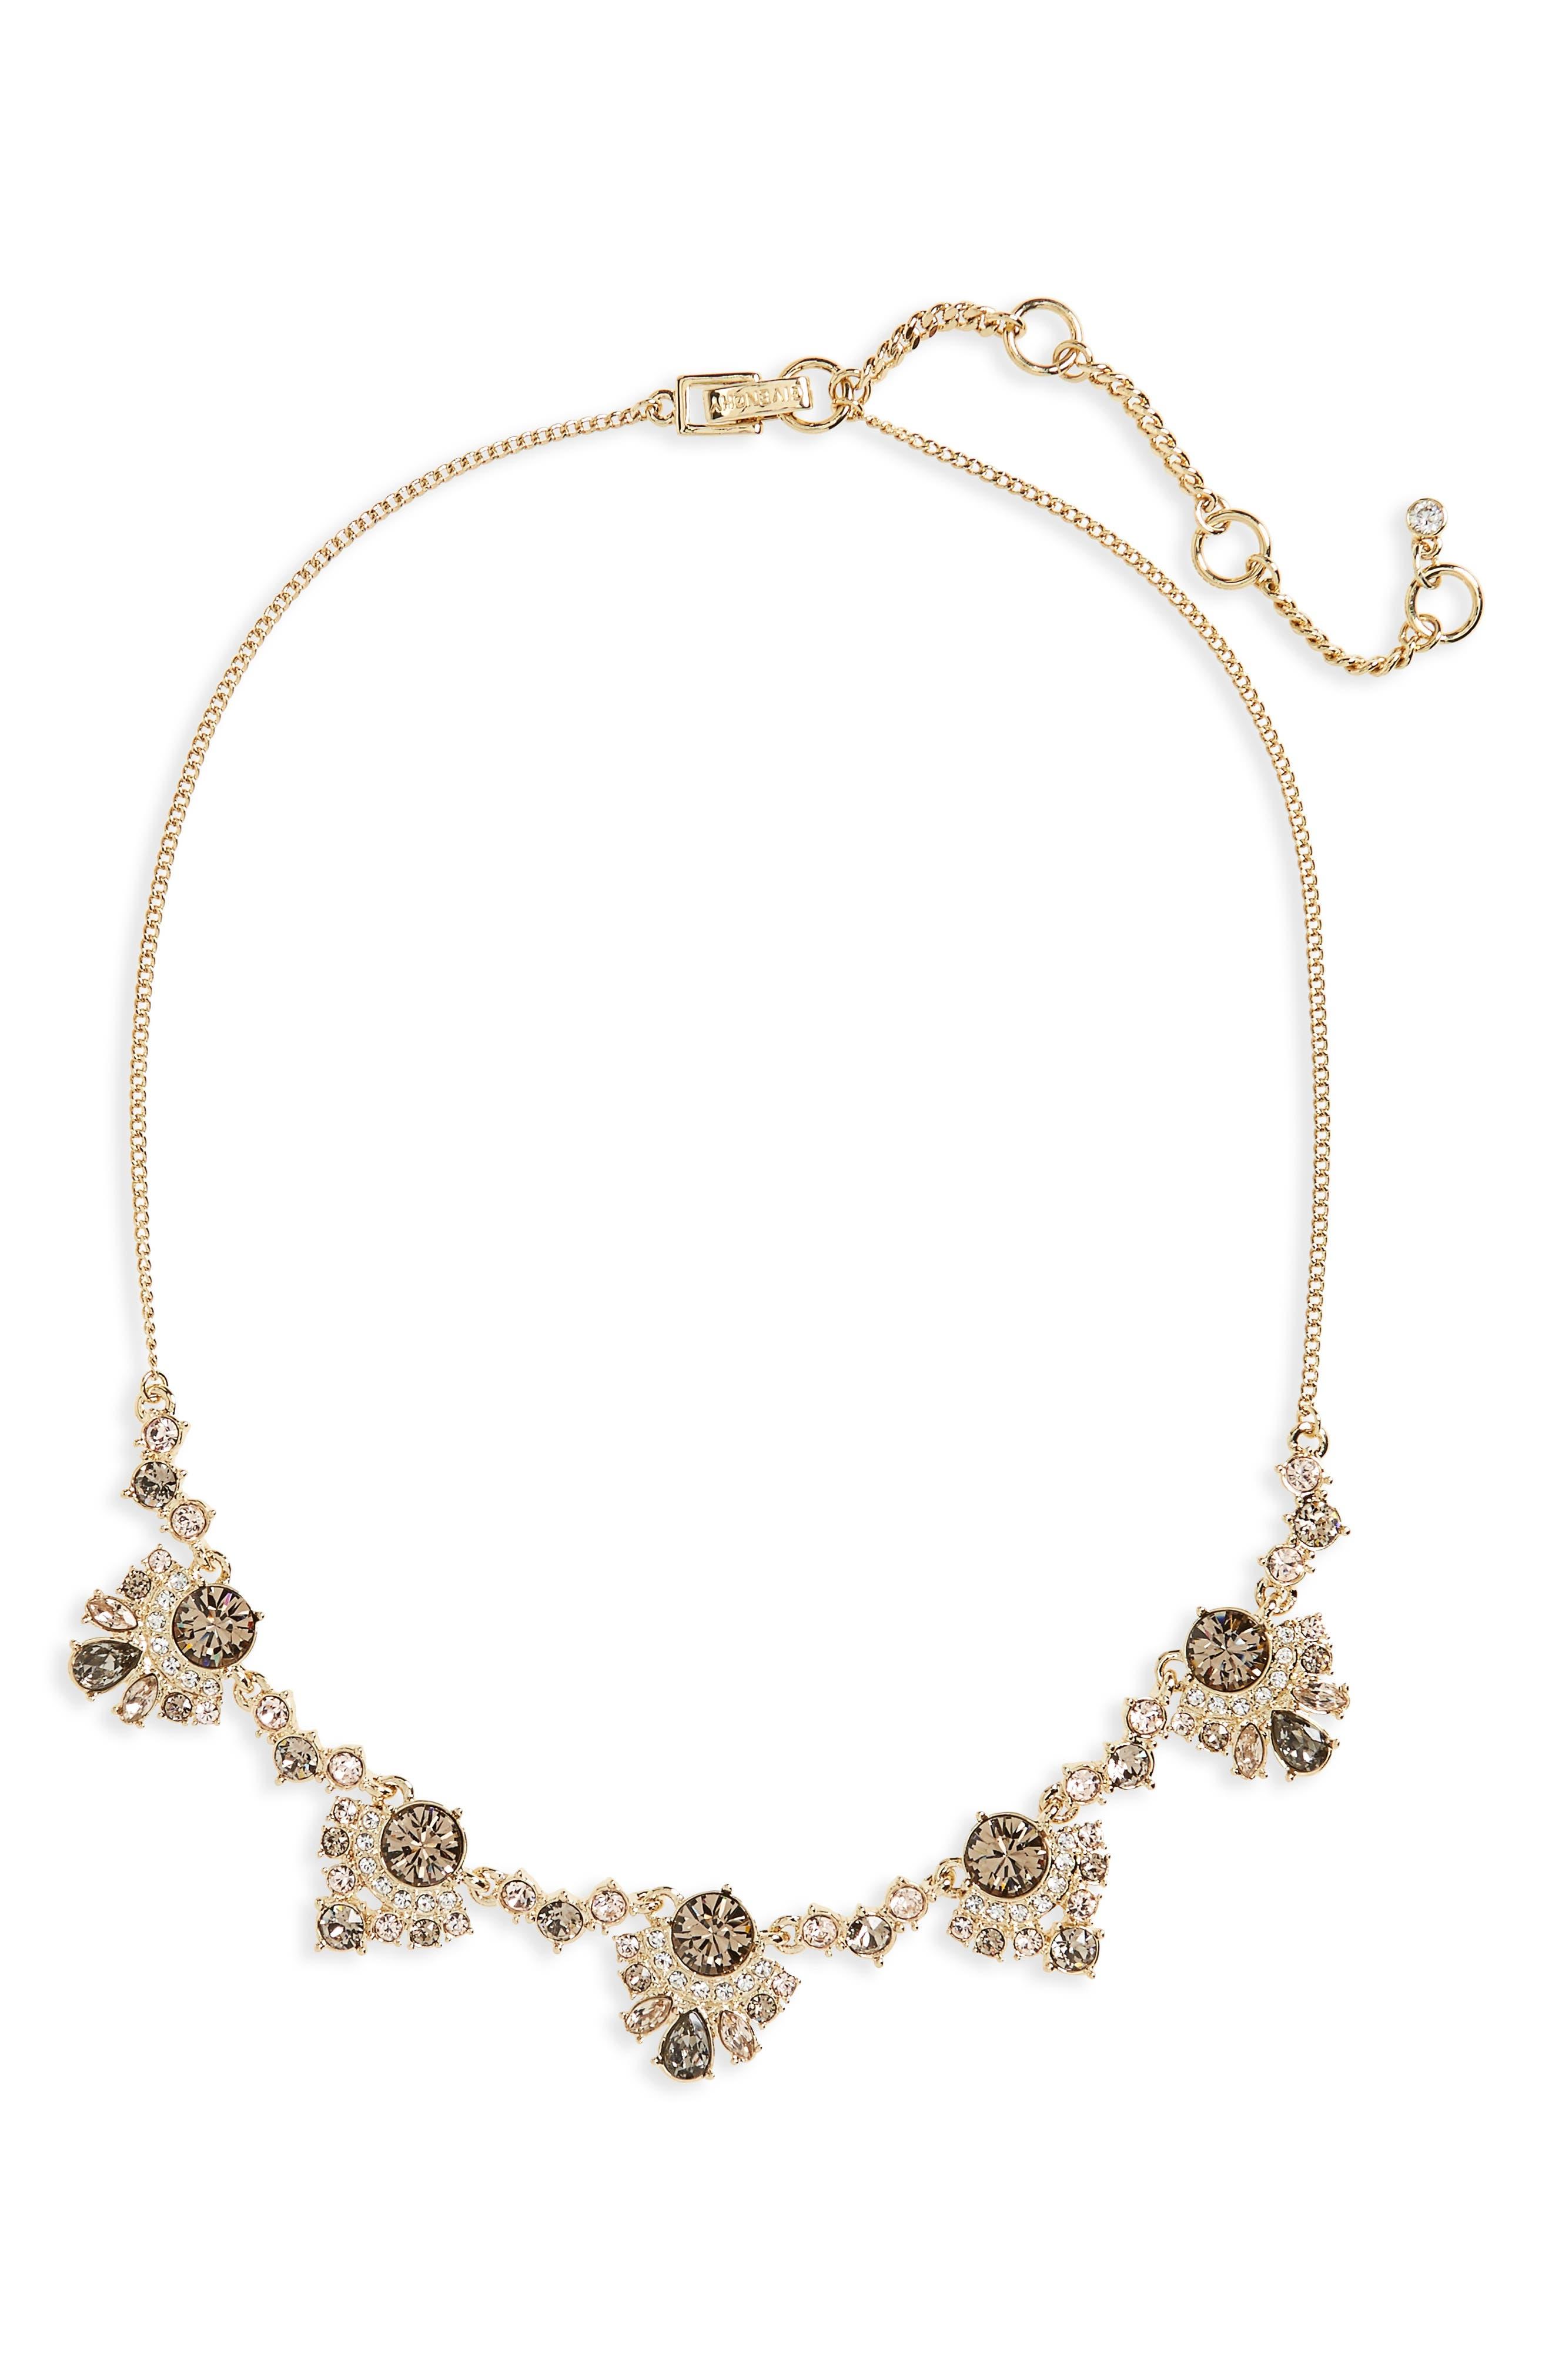 Verona Frontal Necklace,                         Main,                         color, Greige / Gold